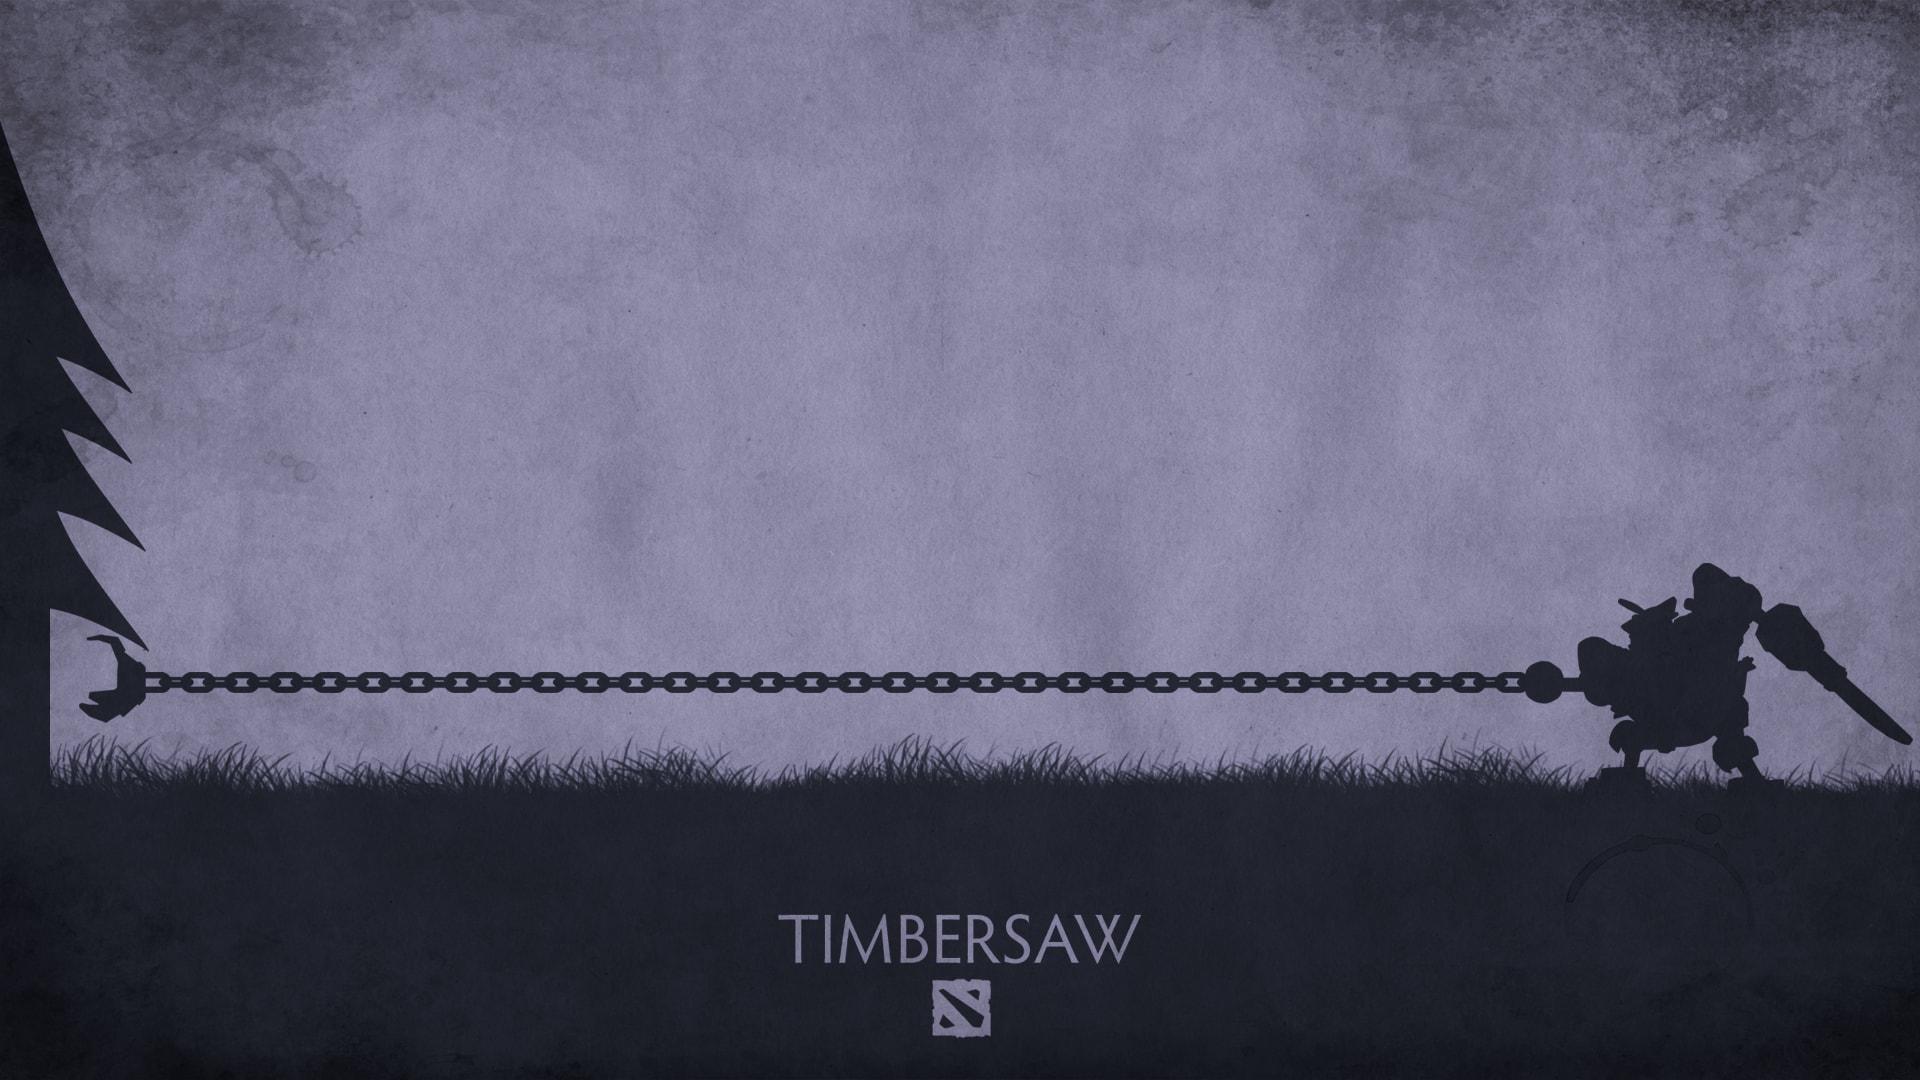 timbersaw build guide dota 2 timbersaw firewalker sharpens the